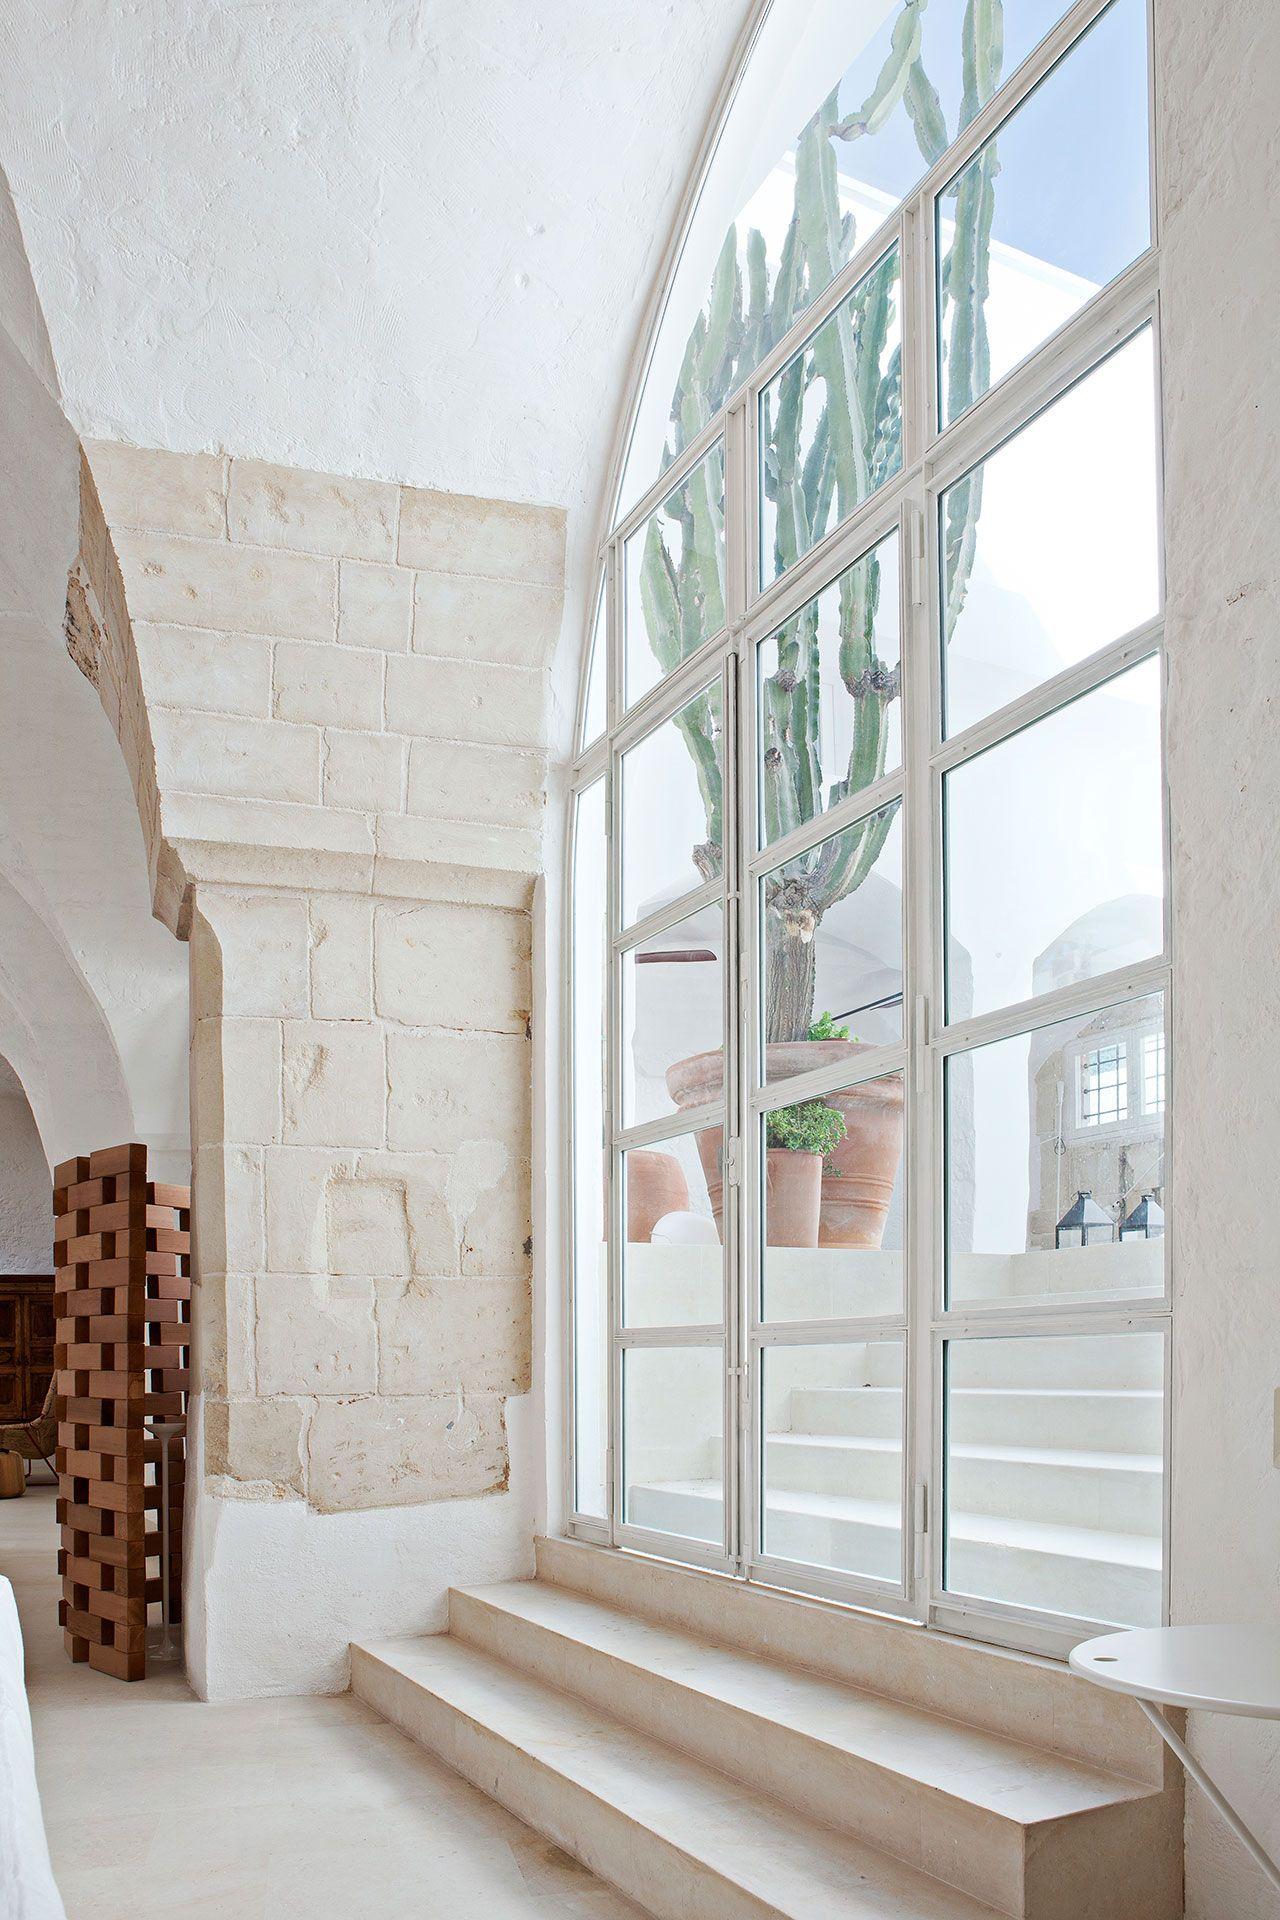 At Home in Puglia with Ludovica + Roberto Palomba | Architecture ...